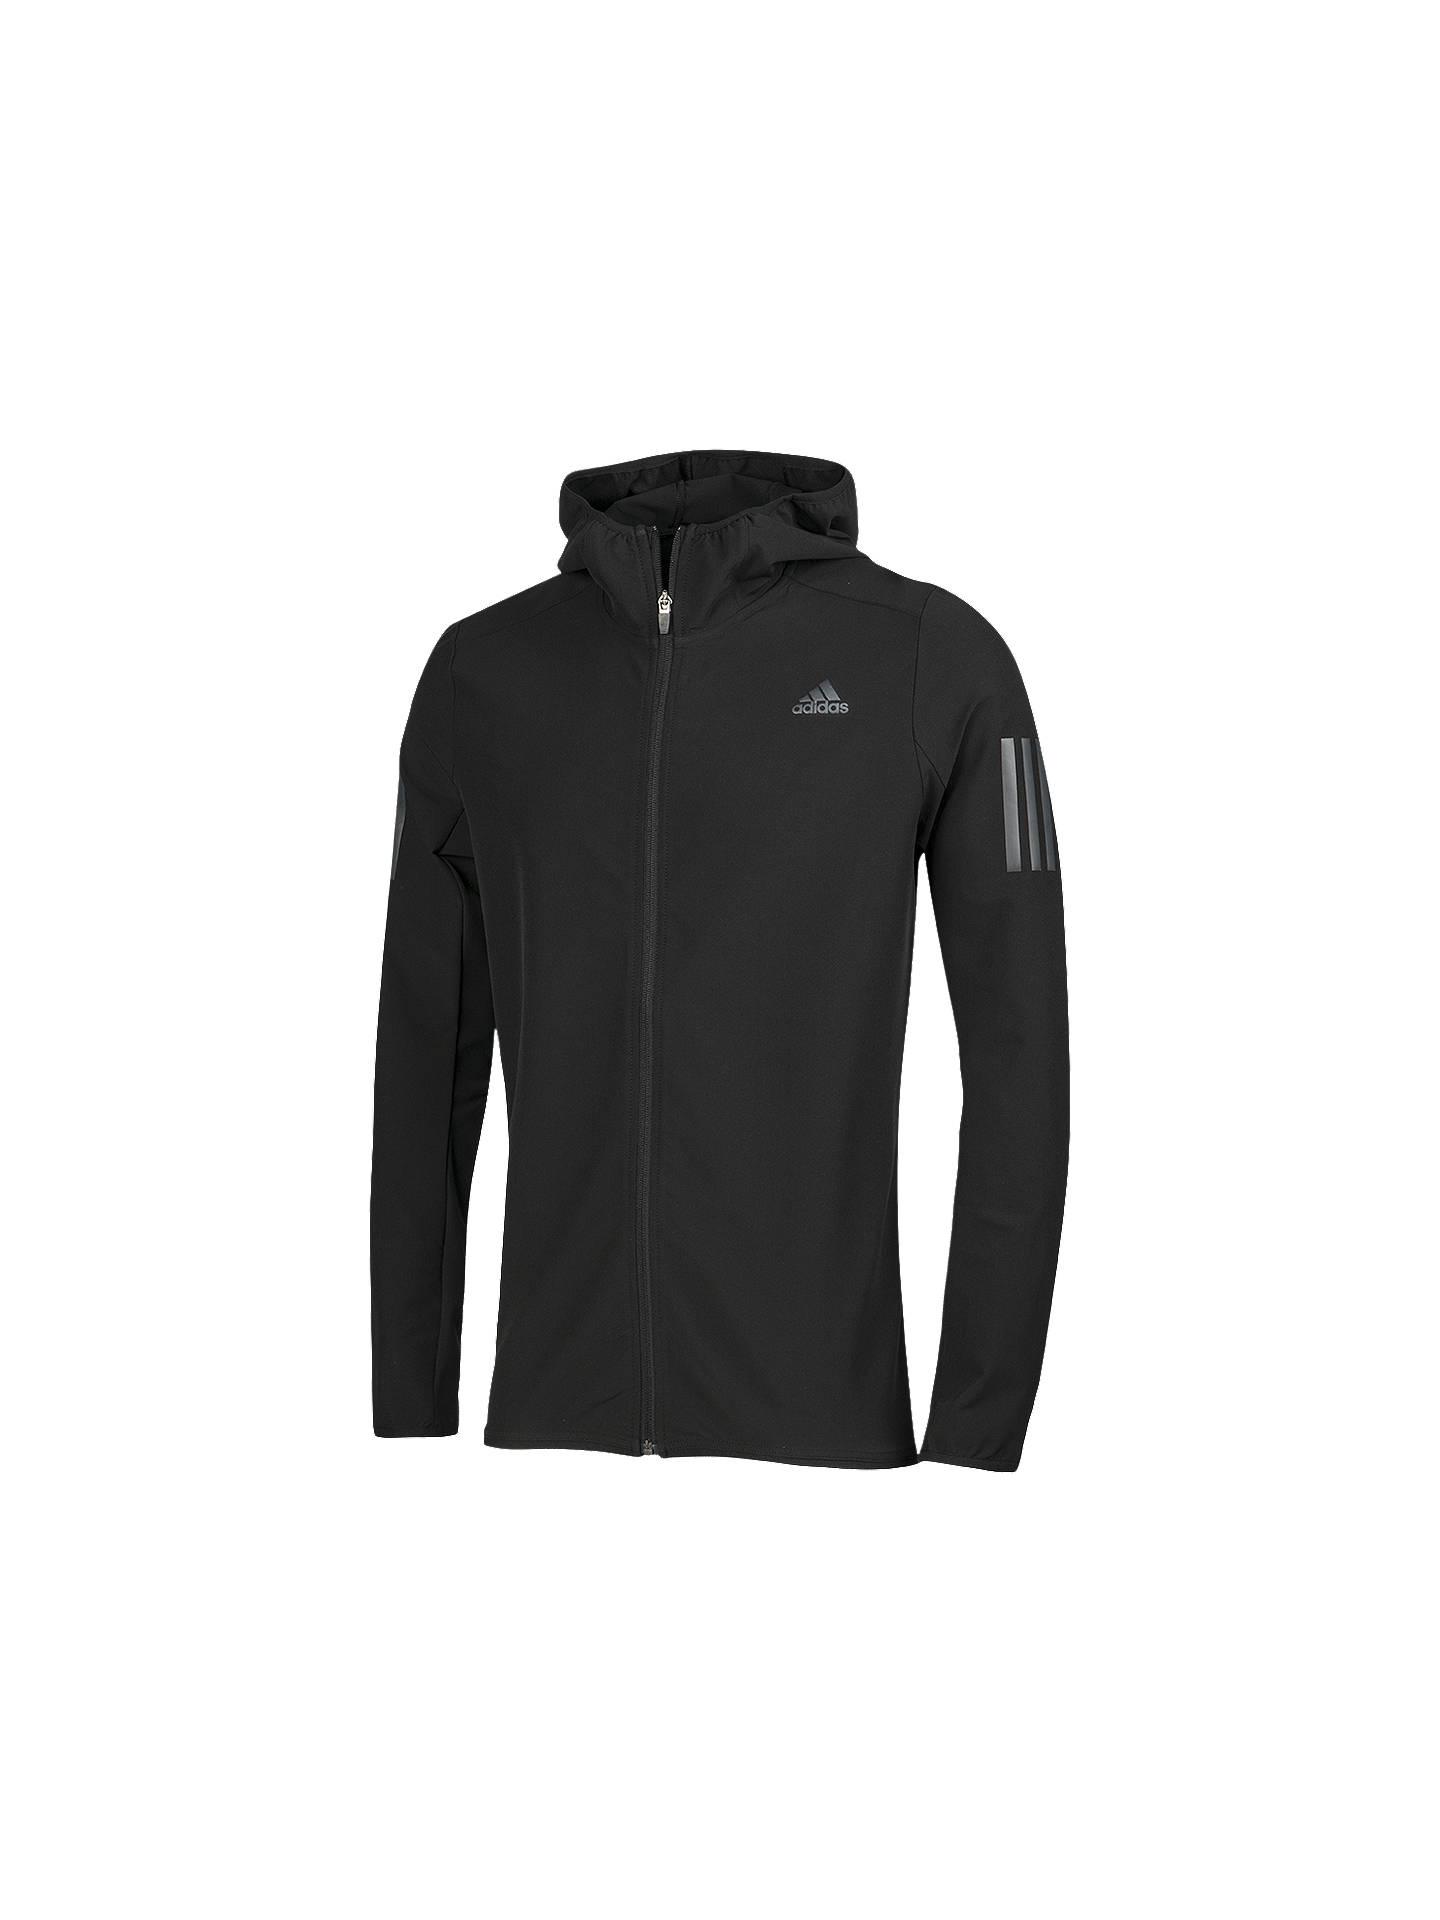 ebb1f9726 Buy adidas Response Shell Men's Running Jacket, Black, S Online at  johnlewis. ...